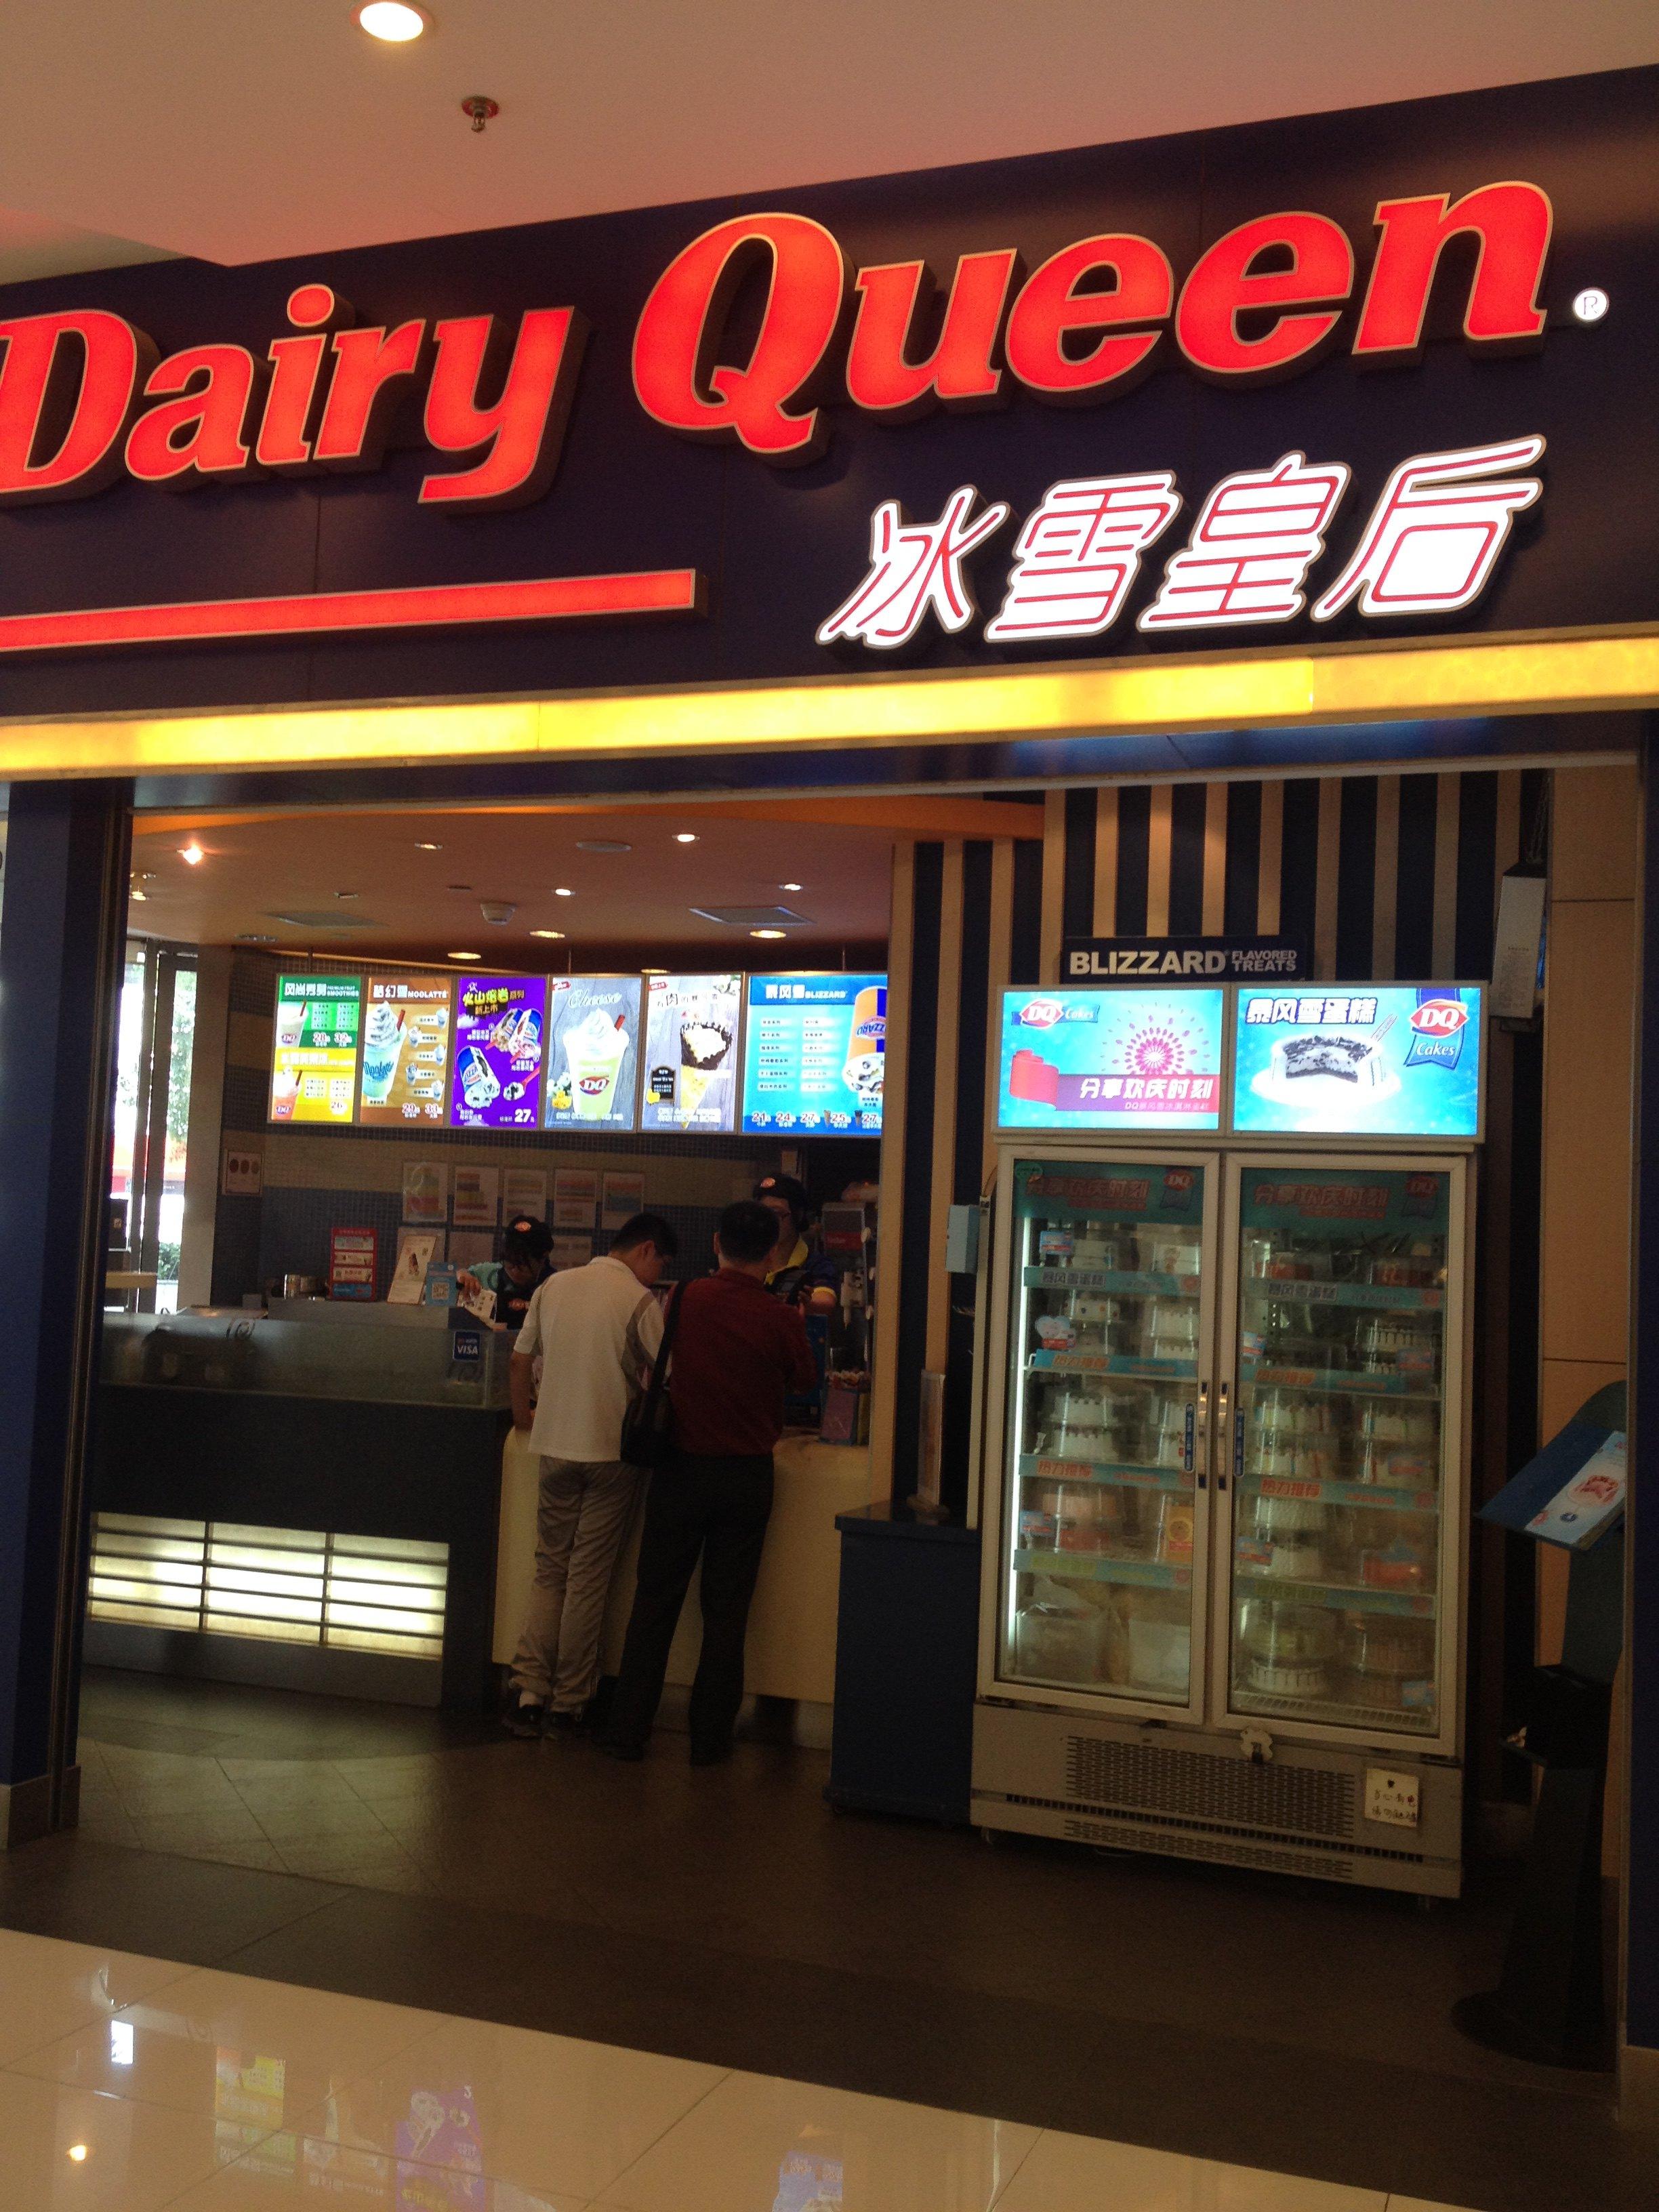 DQ冰雪皇后微信点餐系统体验如何 DQ冰雪皇后微信点餐流程体验